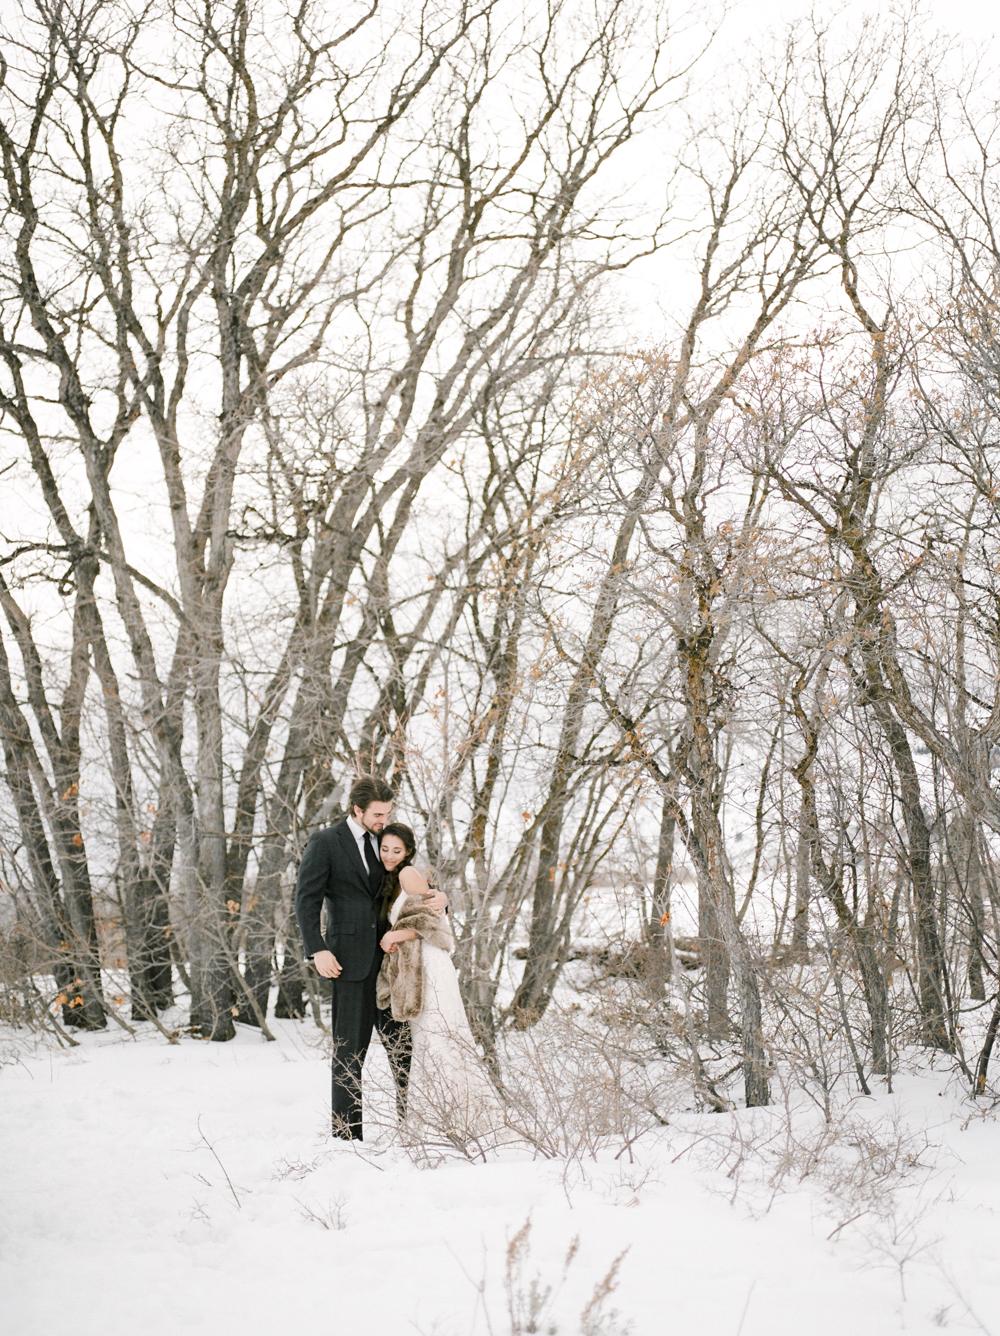 Christine-Gosch-Utah-film-photographer-wedding-mountains-snow-snowy-destination-8.jpg